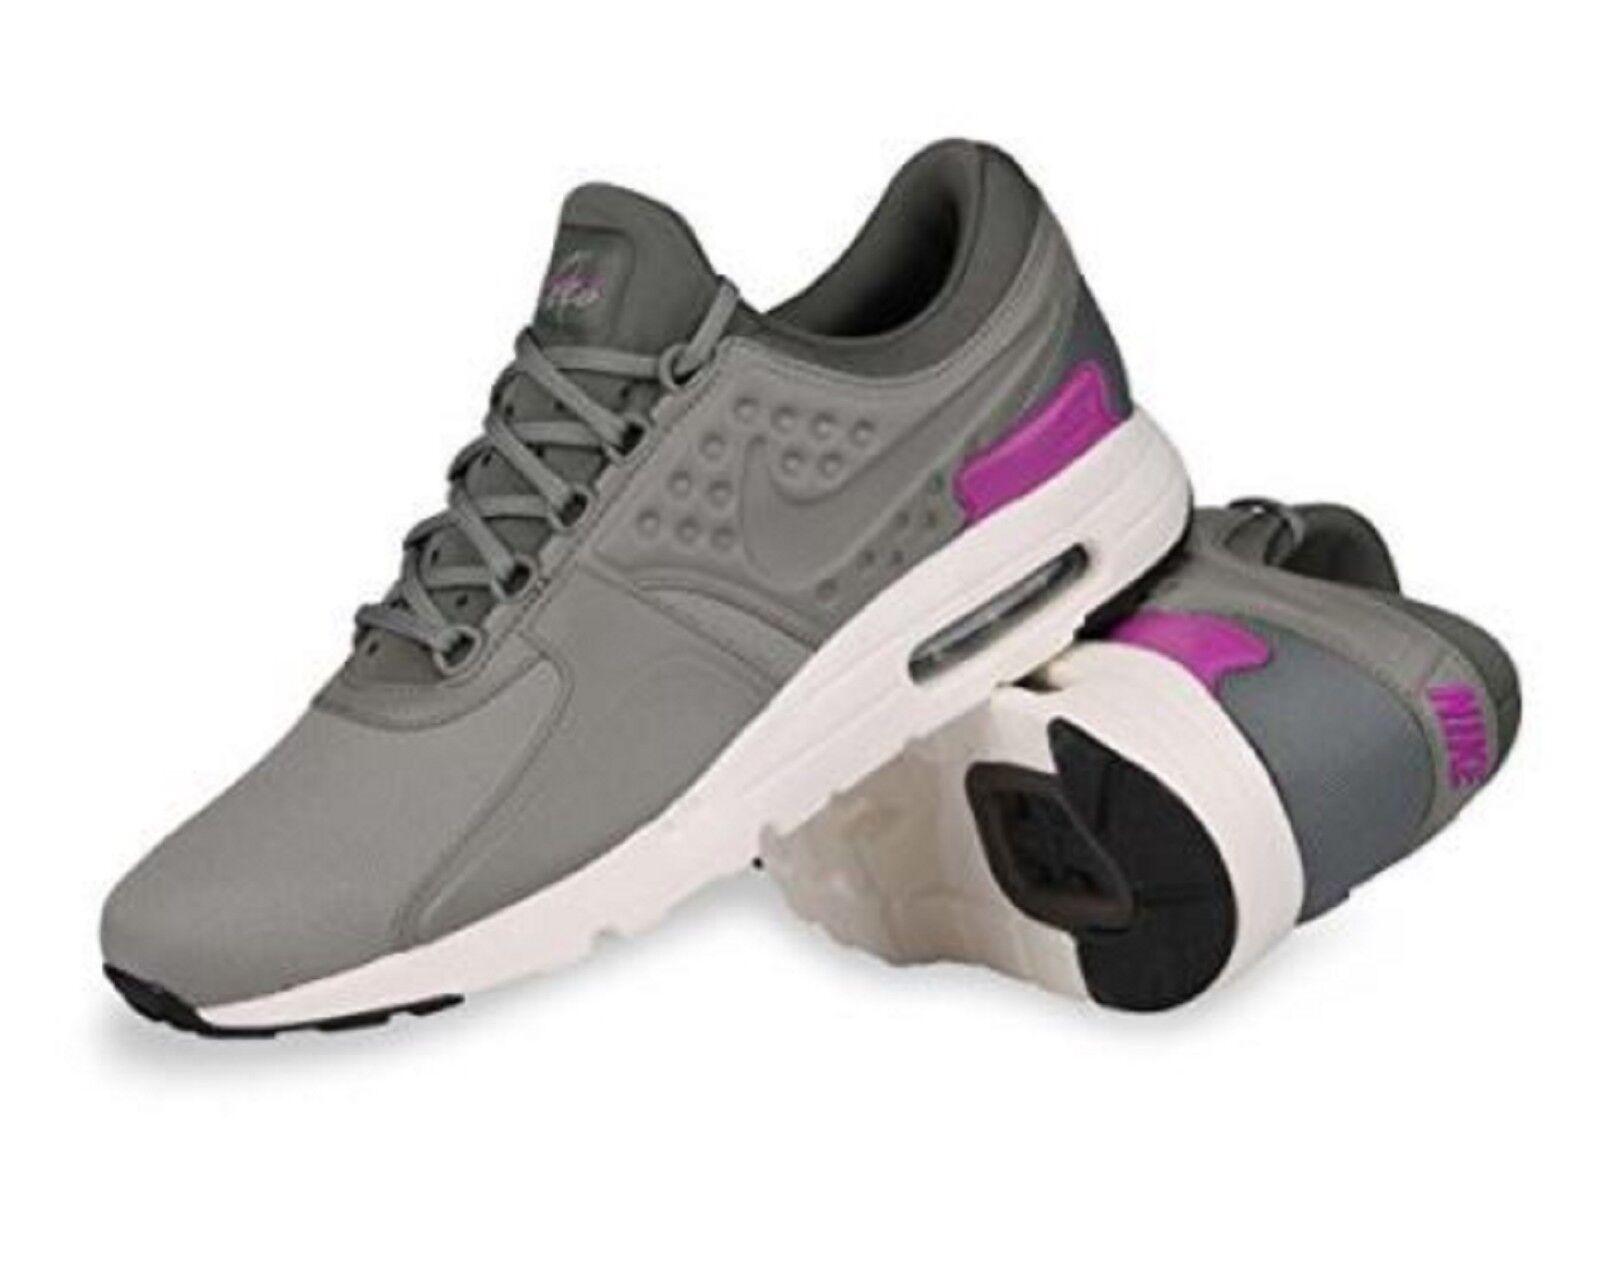 Nike NEW Mens Air Shoes Max Zero Premium Running Shoes Air 881982-004 Size 11 150 b77aa3